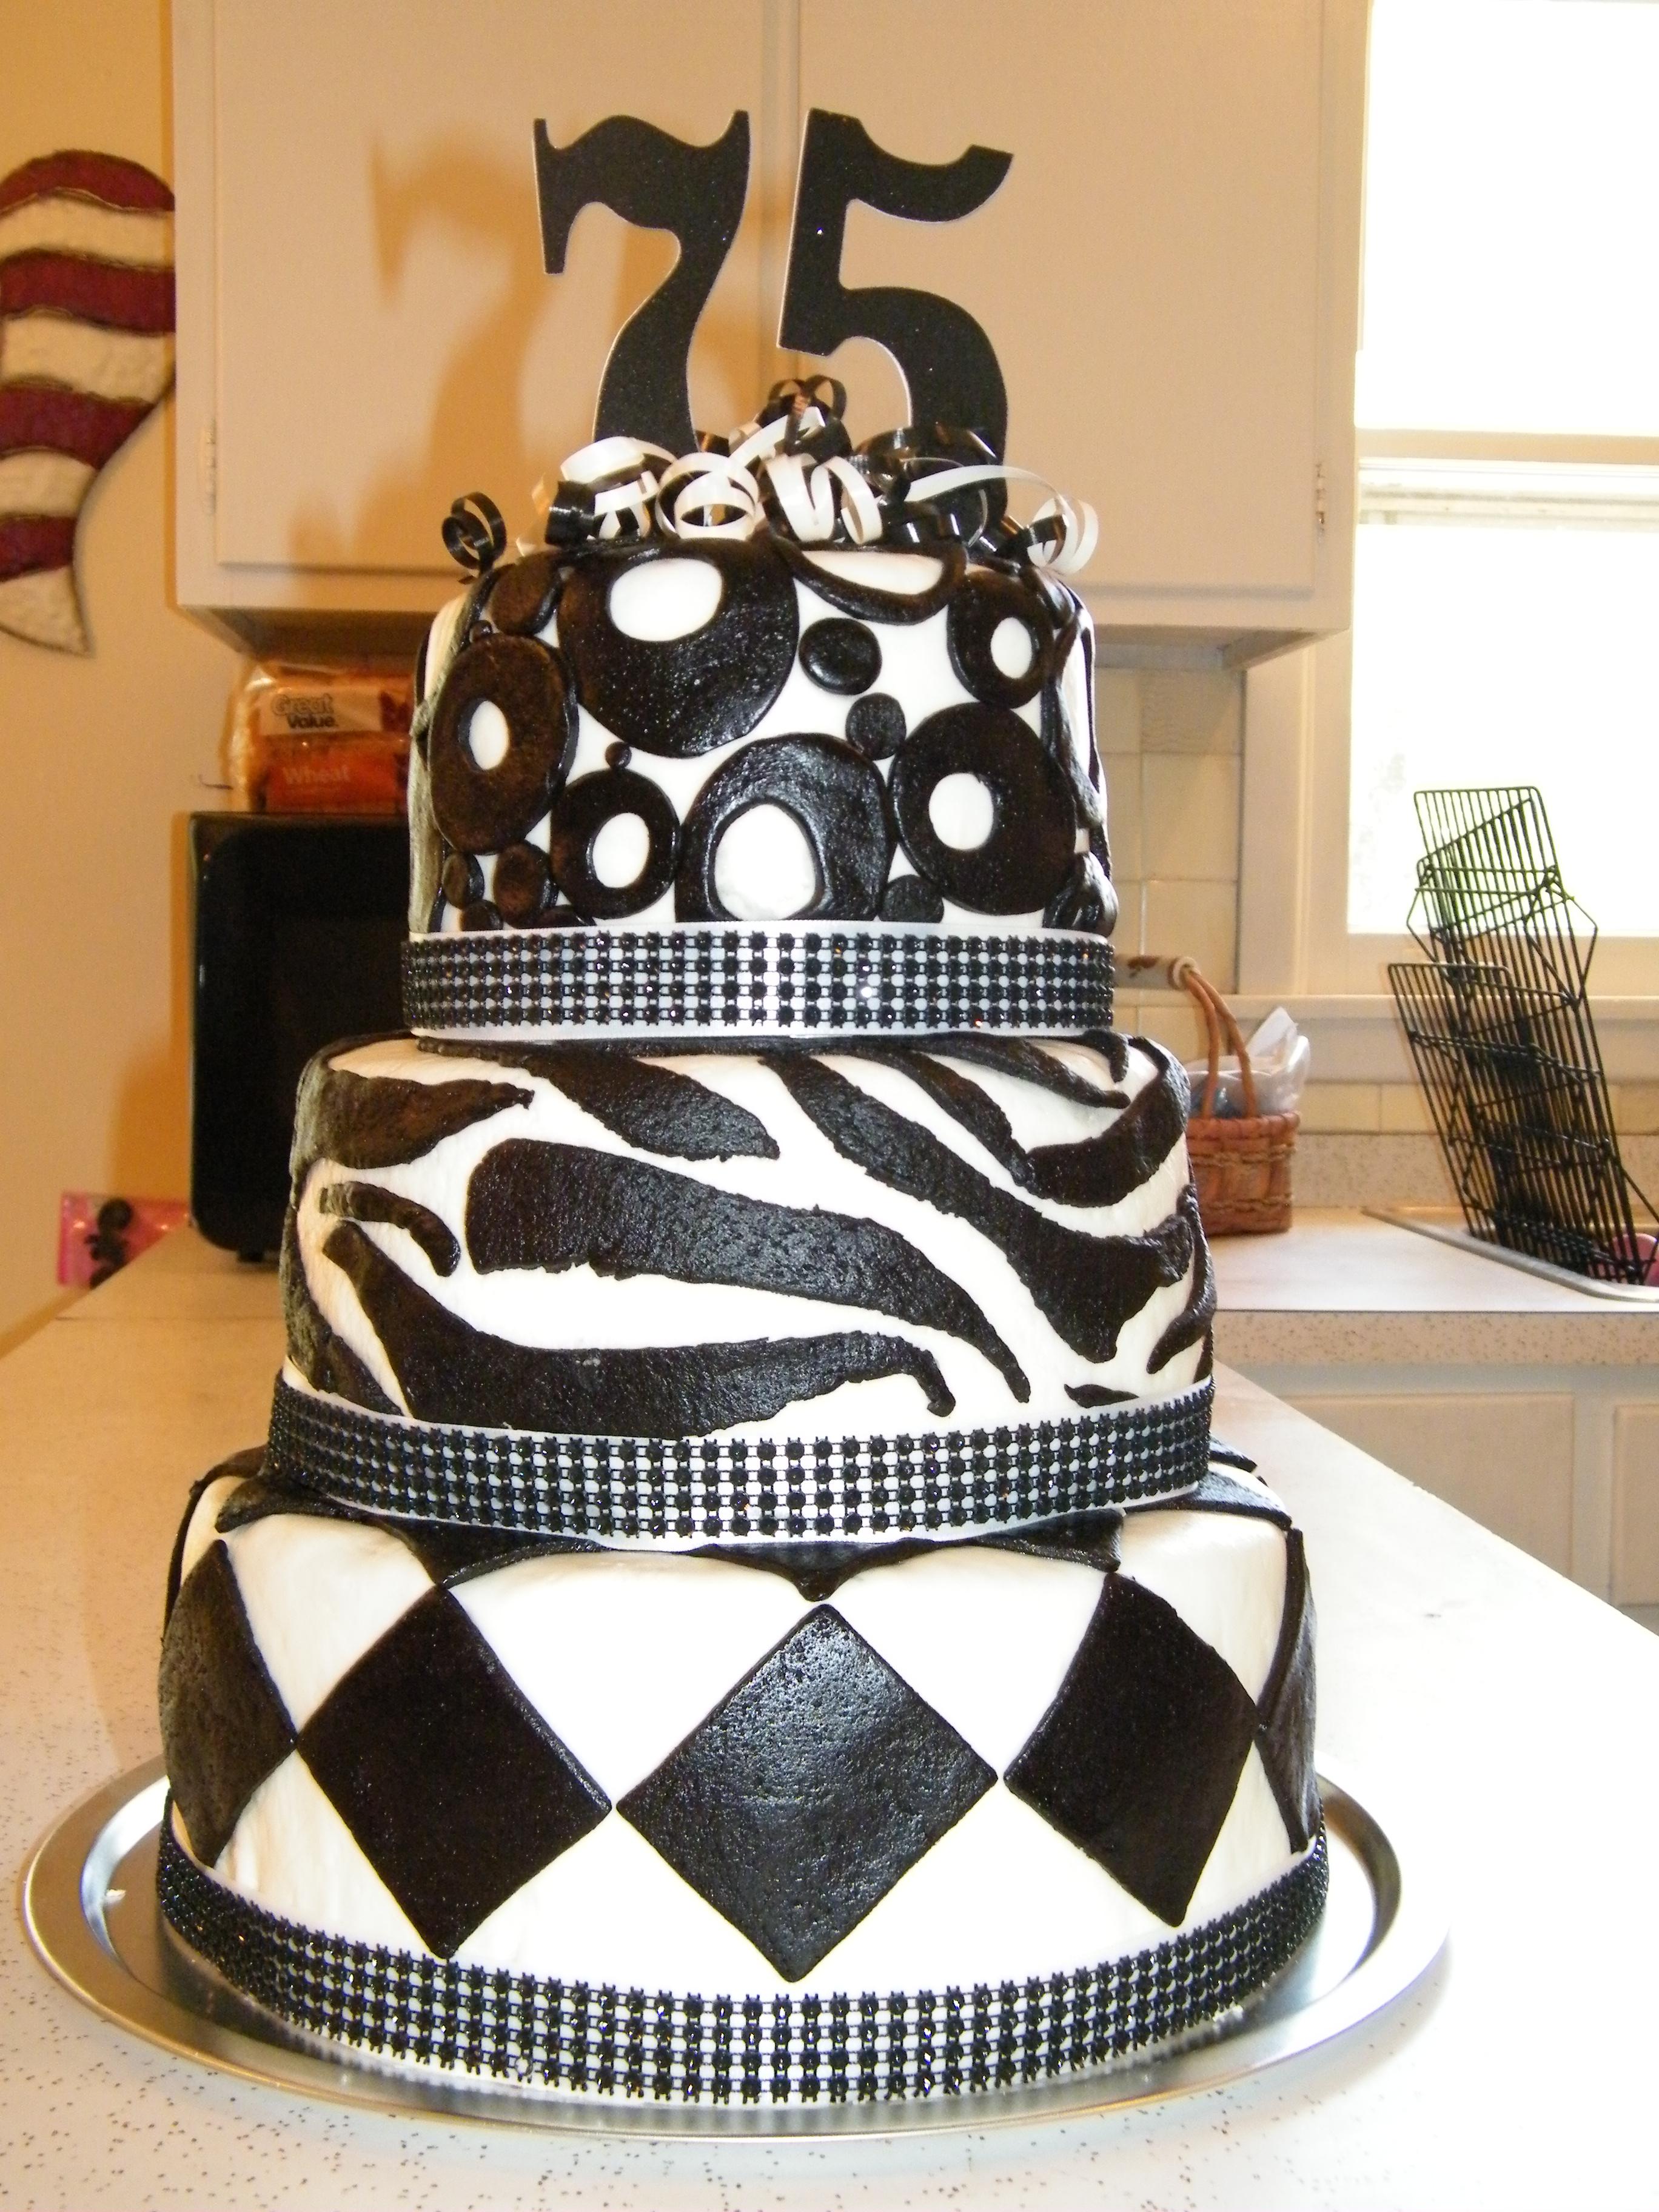 12 75th Birthday Cakes At Publix Photo Wedding Anniversary Cakes